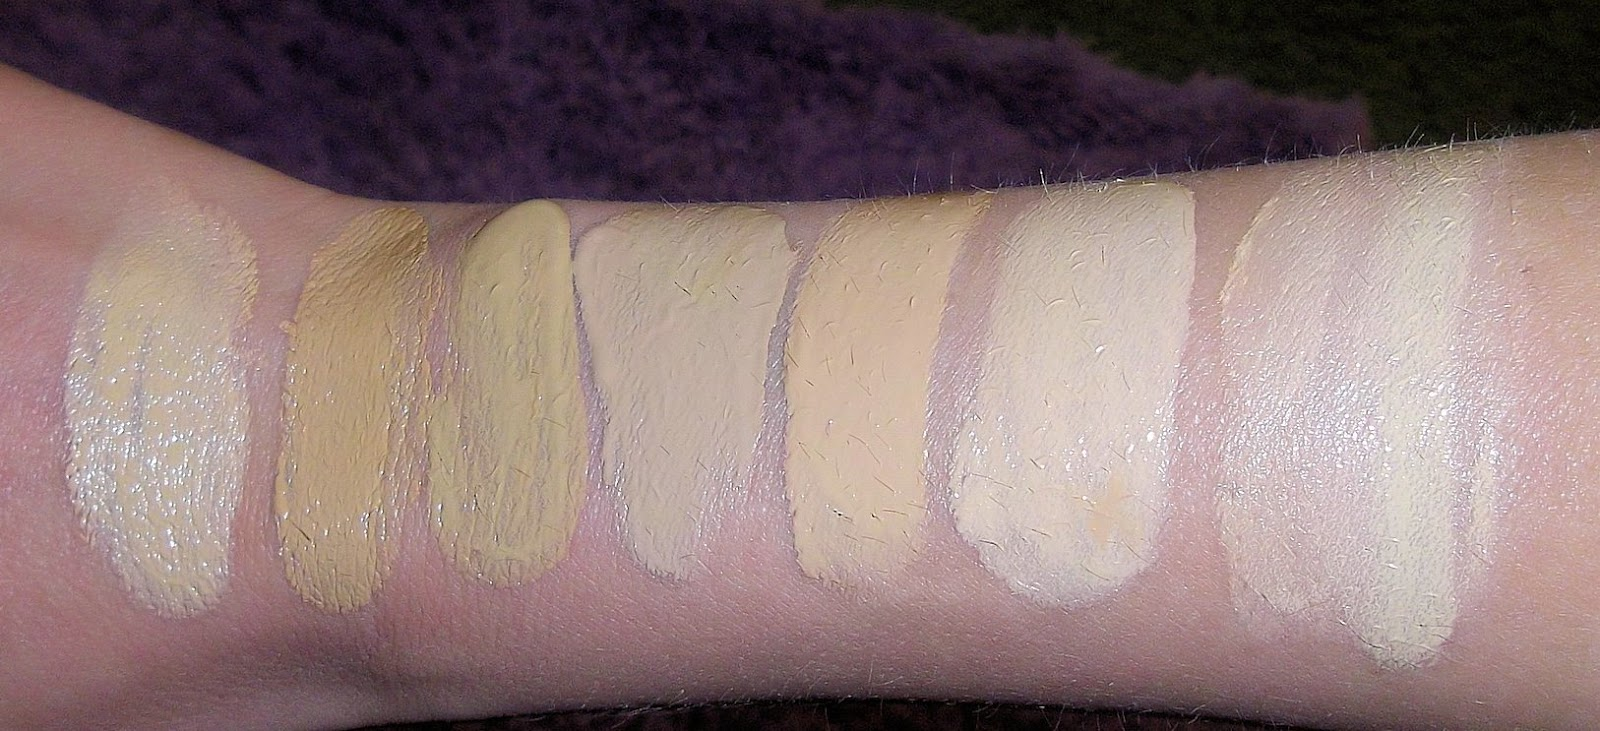 mac face and body foundation shades. bobbi brown foundation swatches mac face and body shades